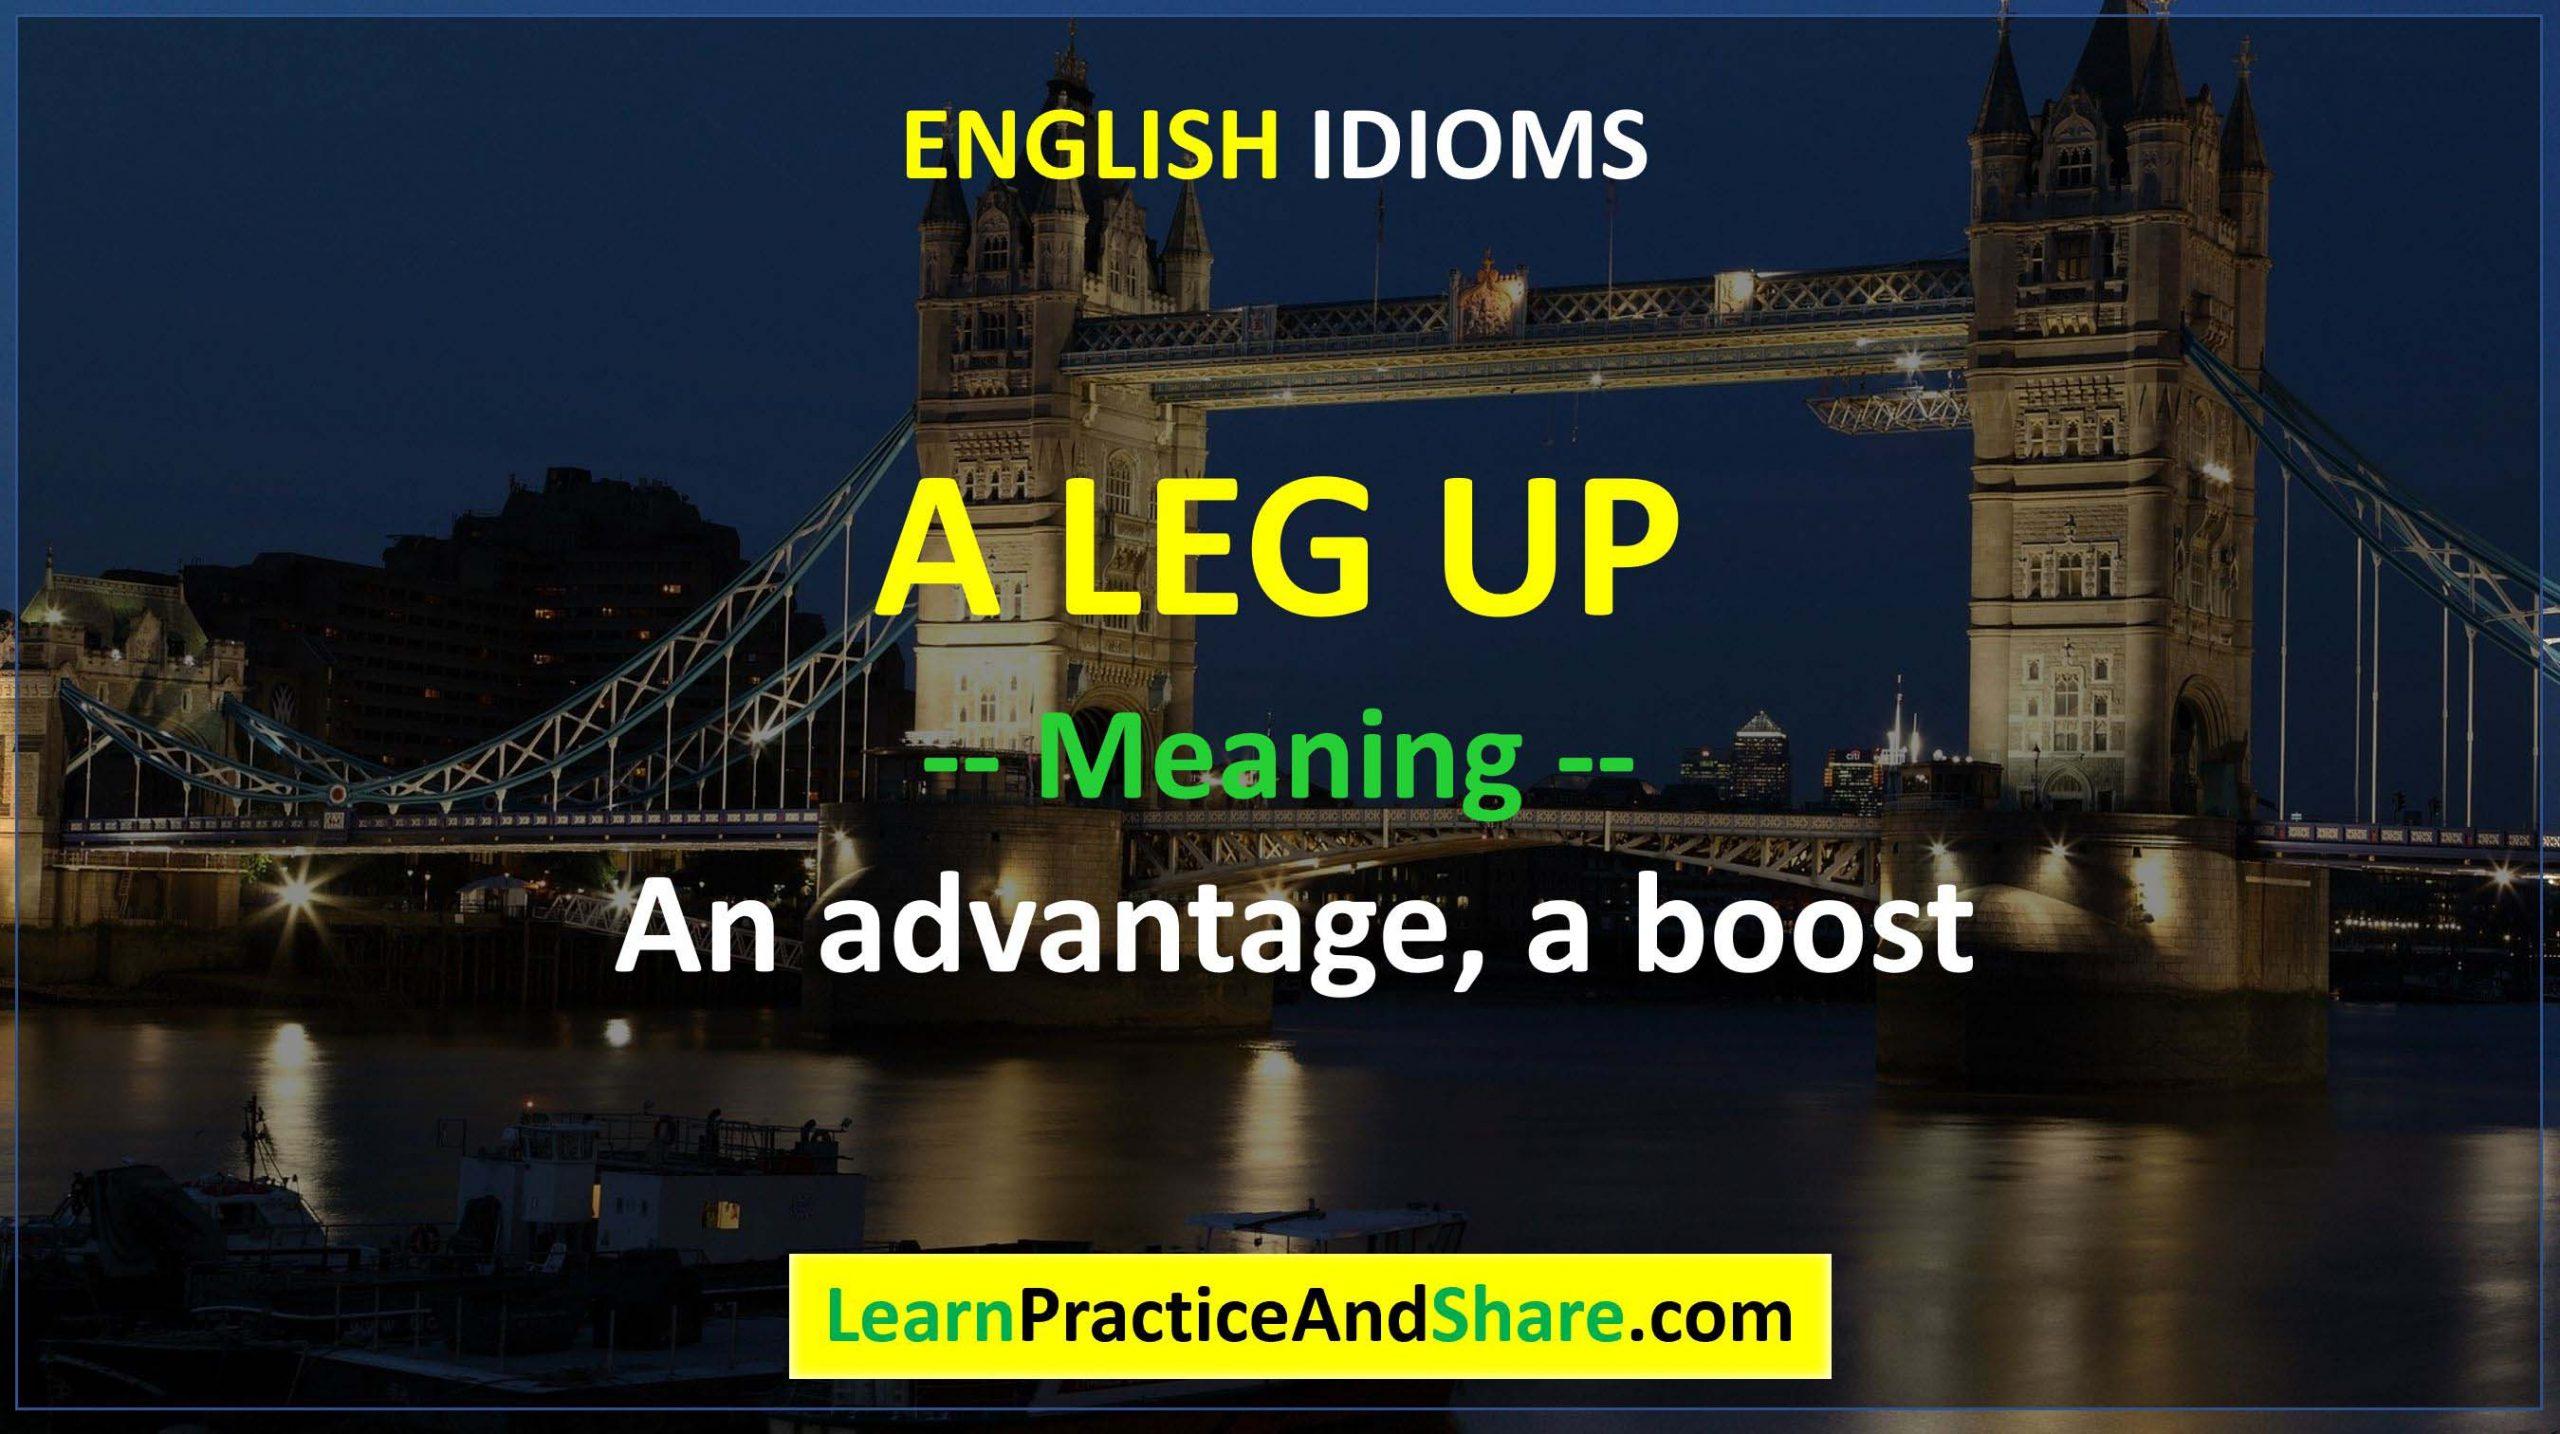 English Idiom - A Leg Up